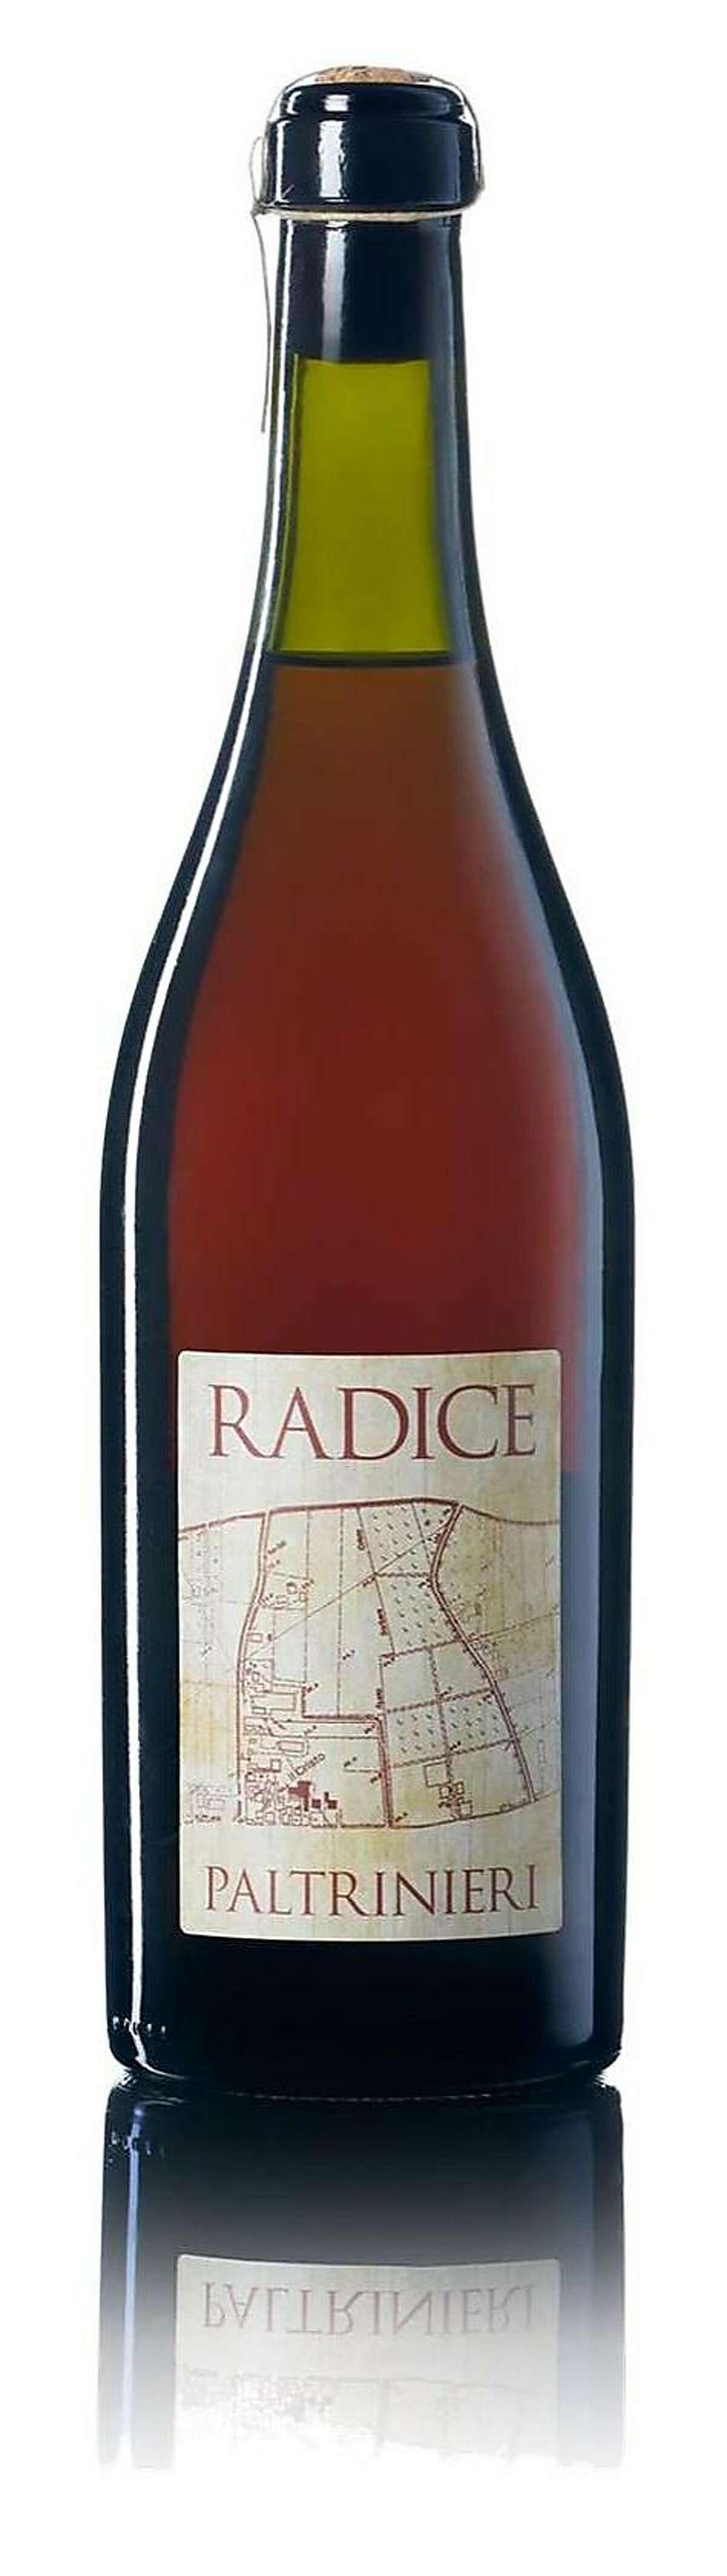 Paltrinieri Radice Lambrusco di Modena Rose 2016 ($22 at Bay Grape)